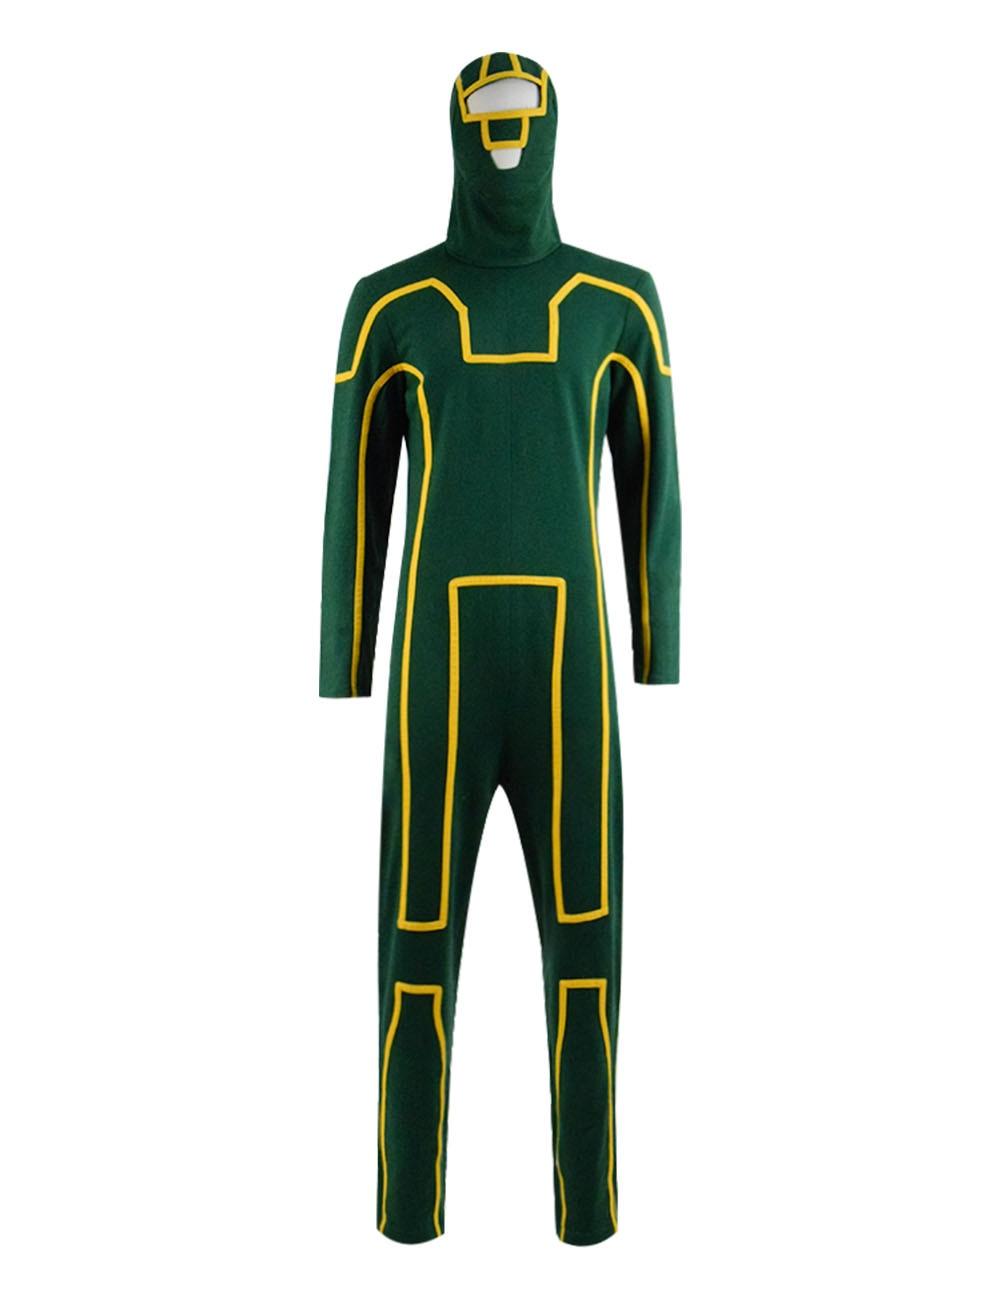 Cosdaddy Halloween Cosplay Kick Green Jumpsuit Dave Lizewski Costume Ass Party Bodysuit Battlesuit For Men